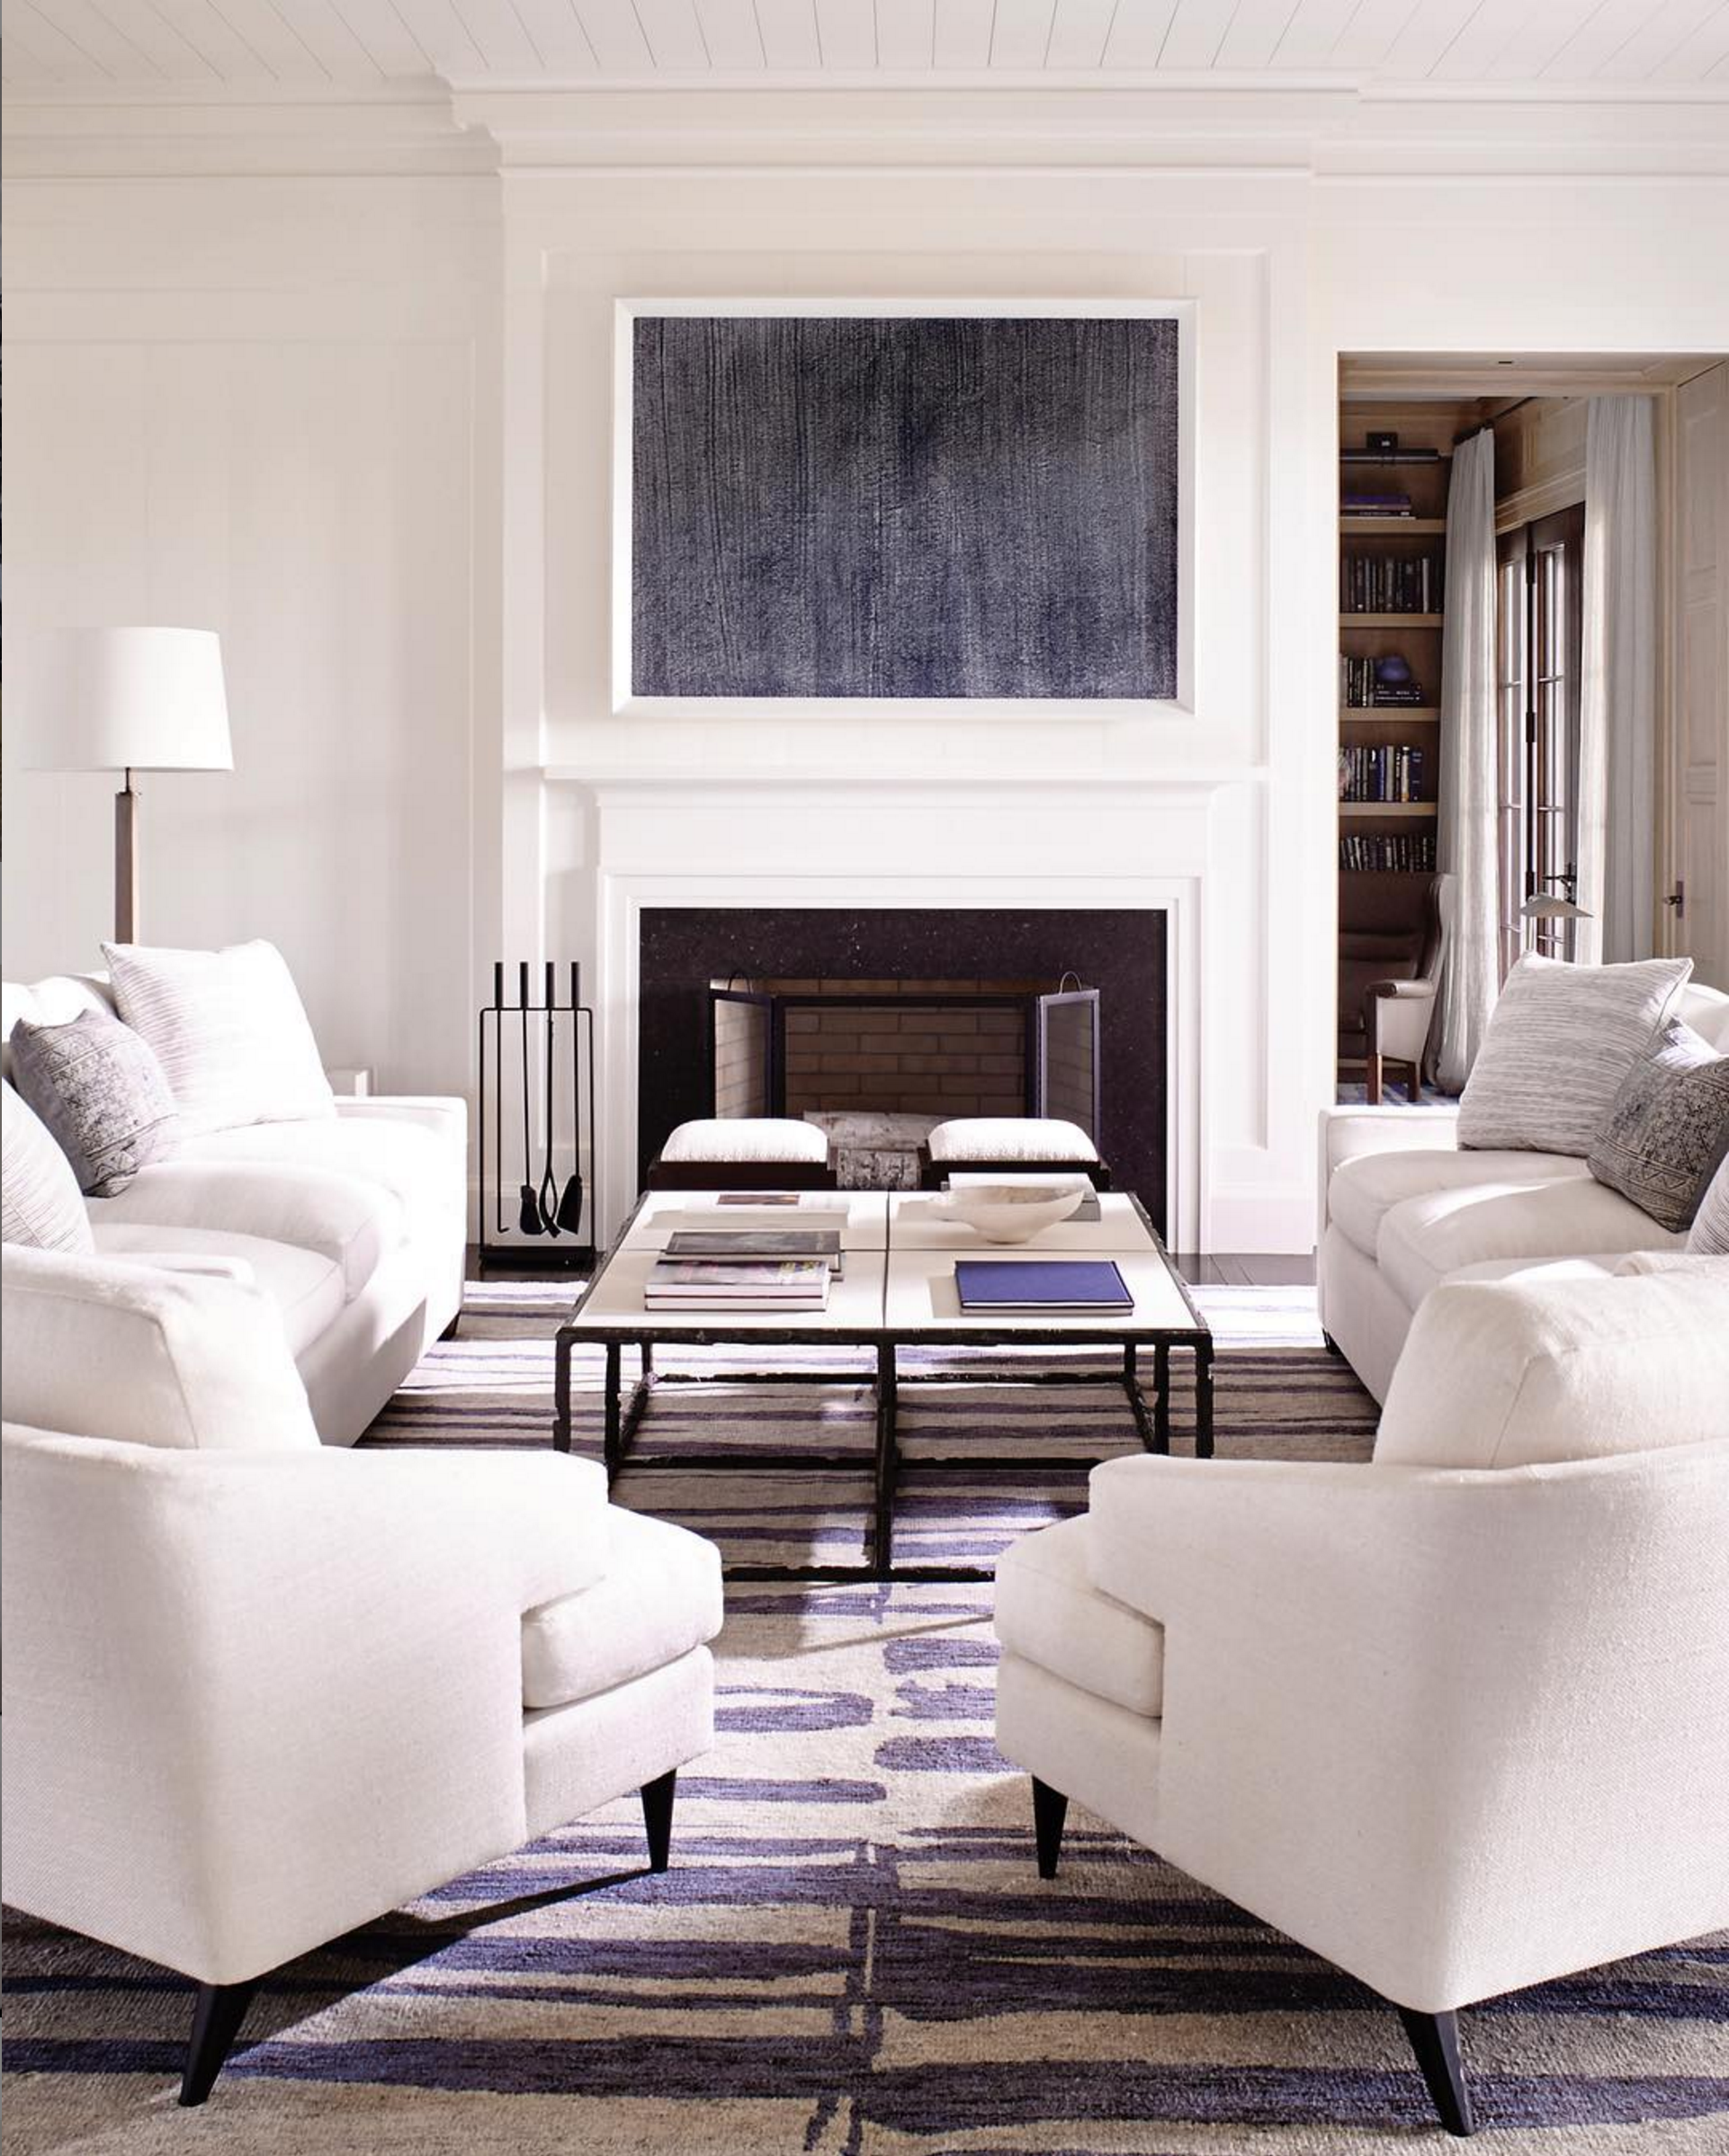 Top 100 Interior Designers In 2020 Victoria Hagan Living Room Spaces Living Room Lounge